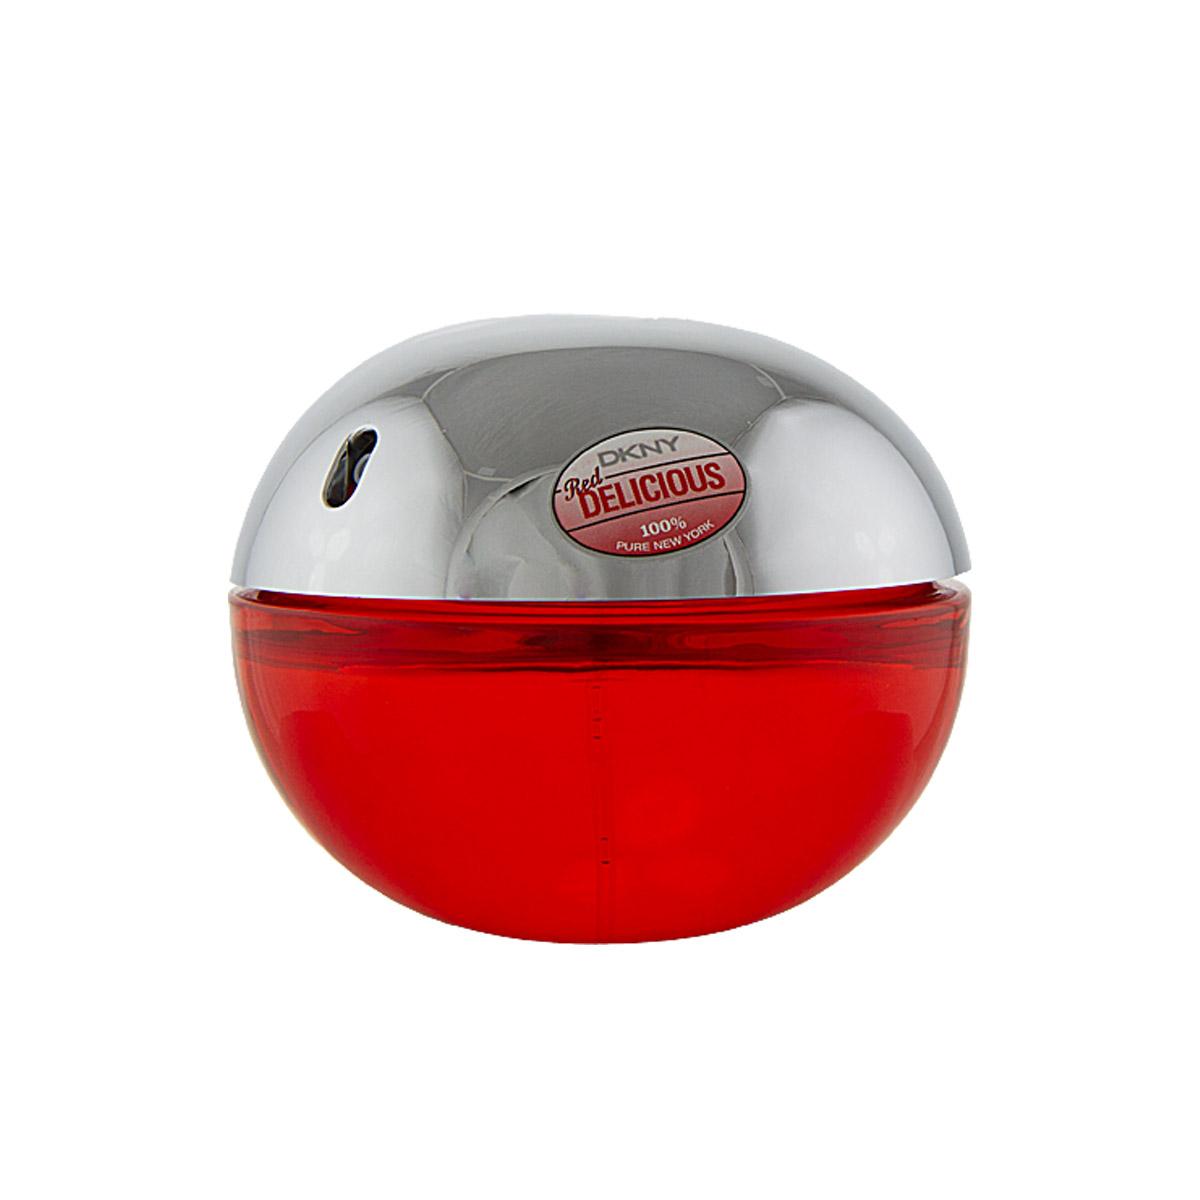 DKNY Donna Karan Red Delicious Eau De Parfum - tester 100 ml (woman)